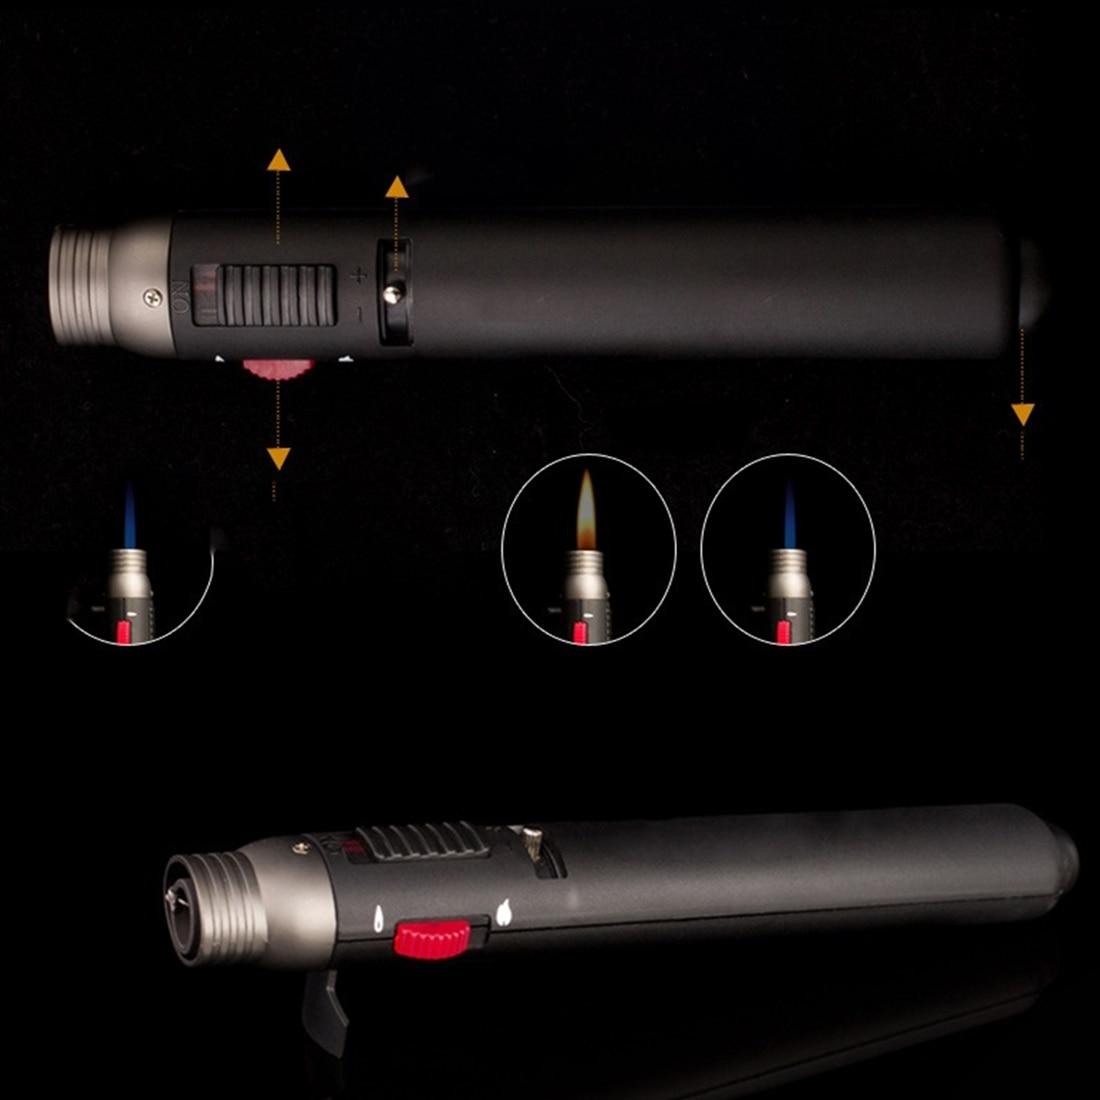 Mini Welding Outdoor Lighter 1300 Degree Torch Jet Flame Portable Pencil Butane Gas Refillable Fuel Welding Soldering Pen